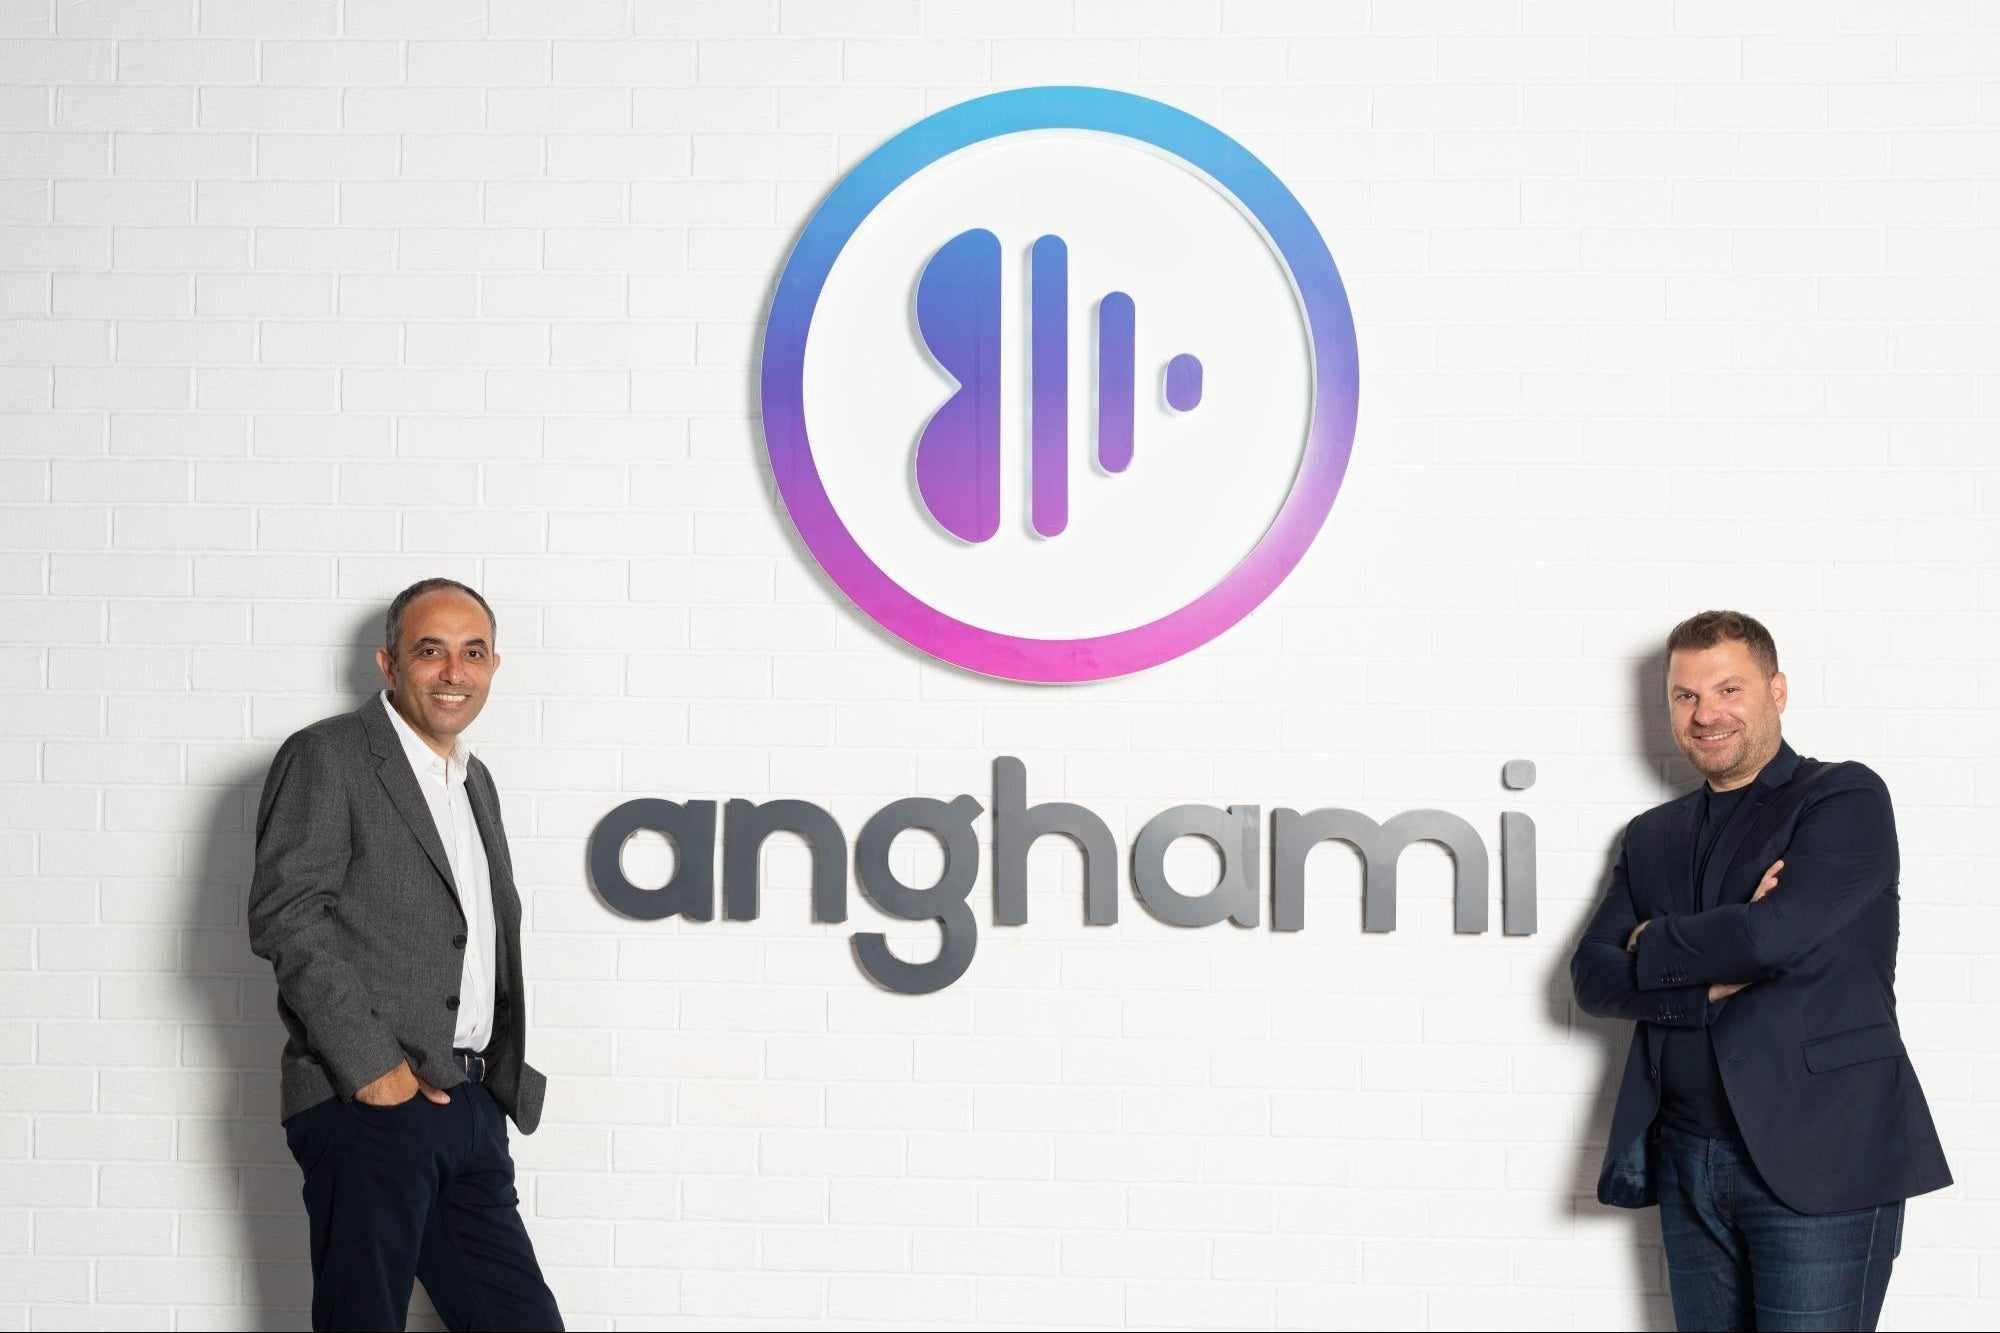 abu-dhabi company anghami entrepreneur headquartered